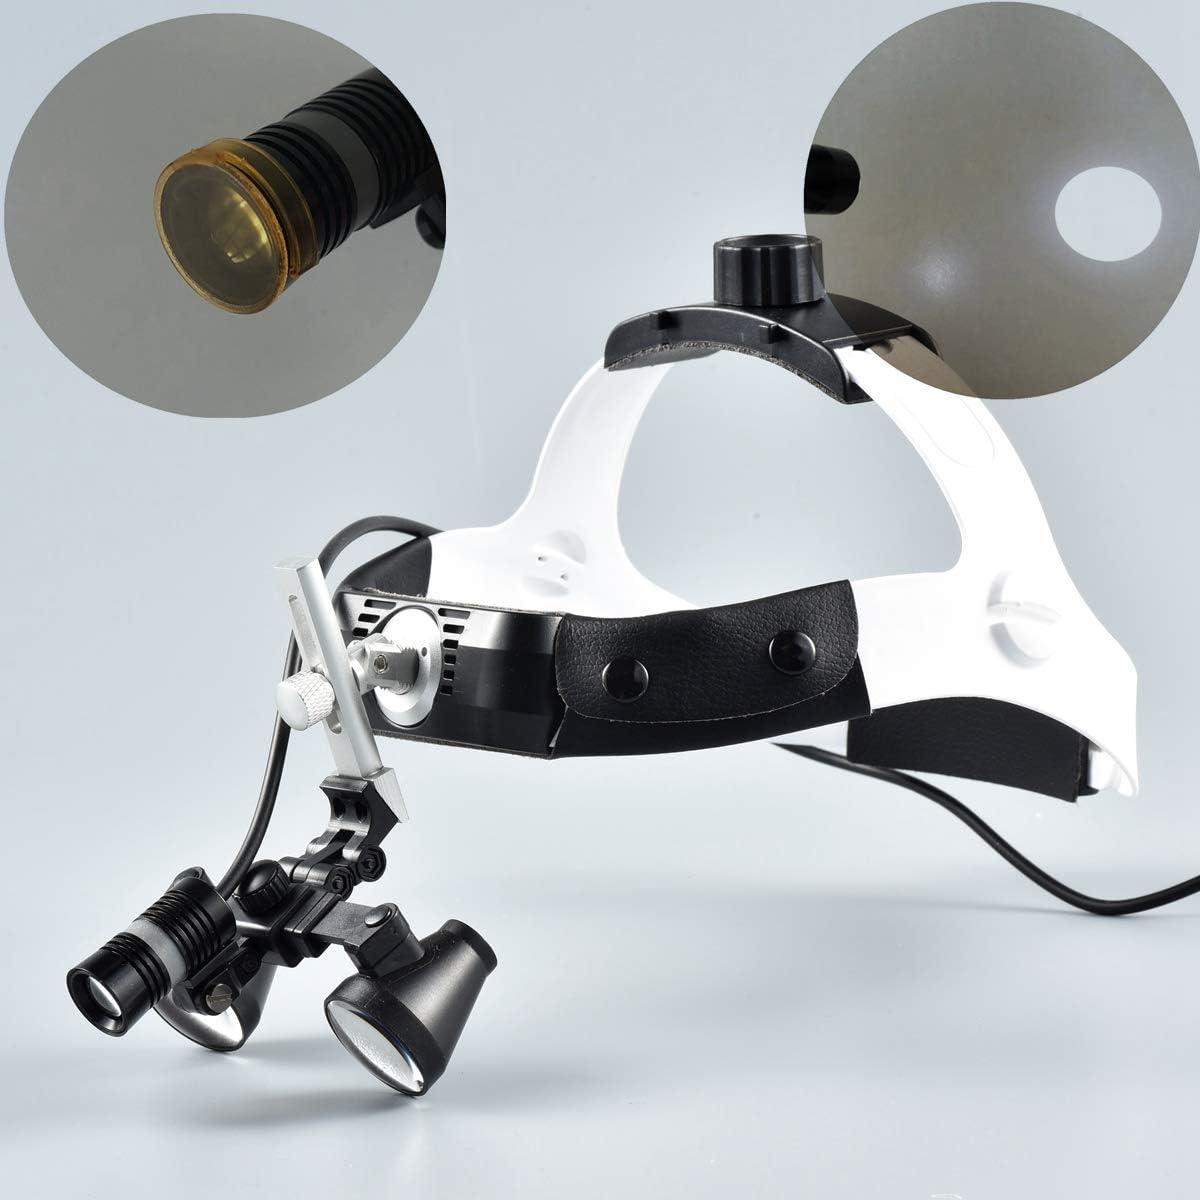 specialty shop Songzi Optics 2.5X 3X 3.5X Medical Selling and selling S Binocular Headband Optional